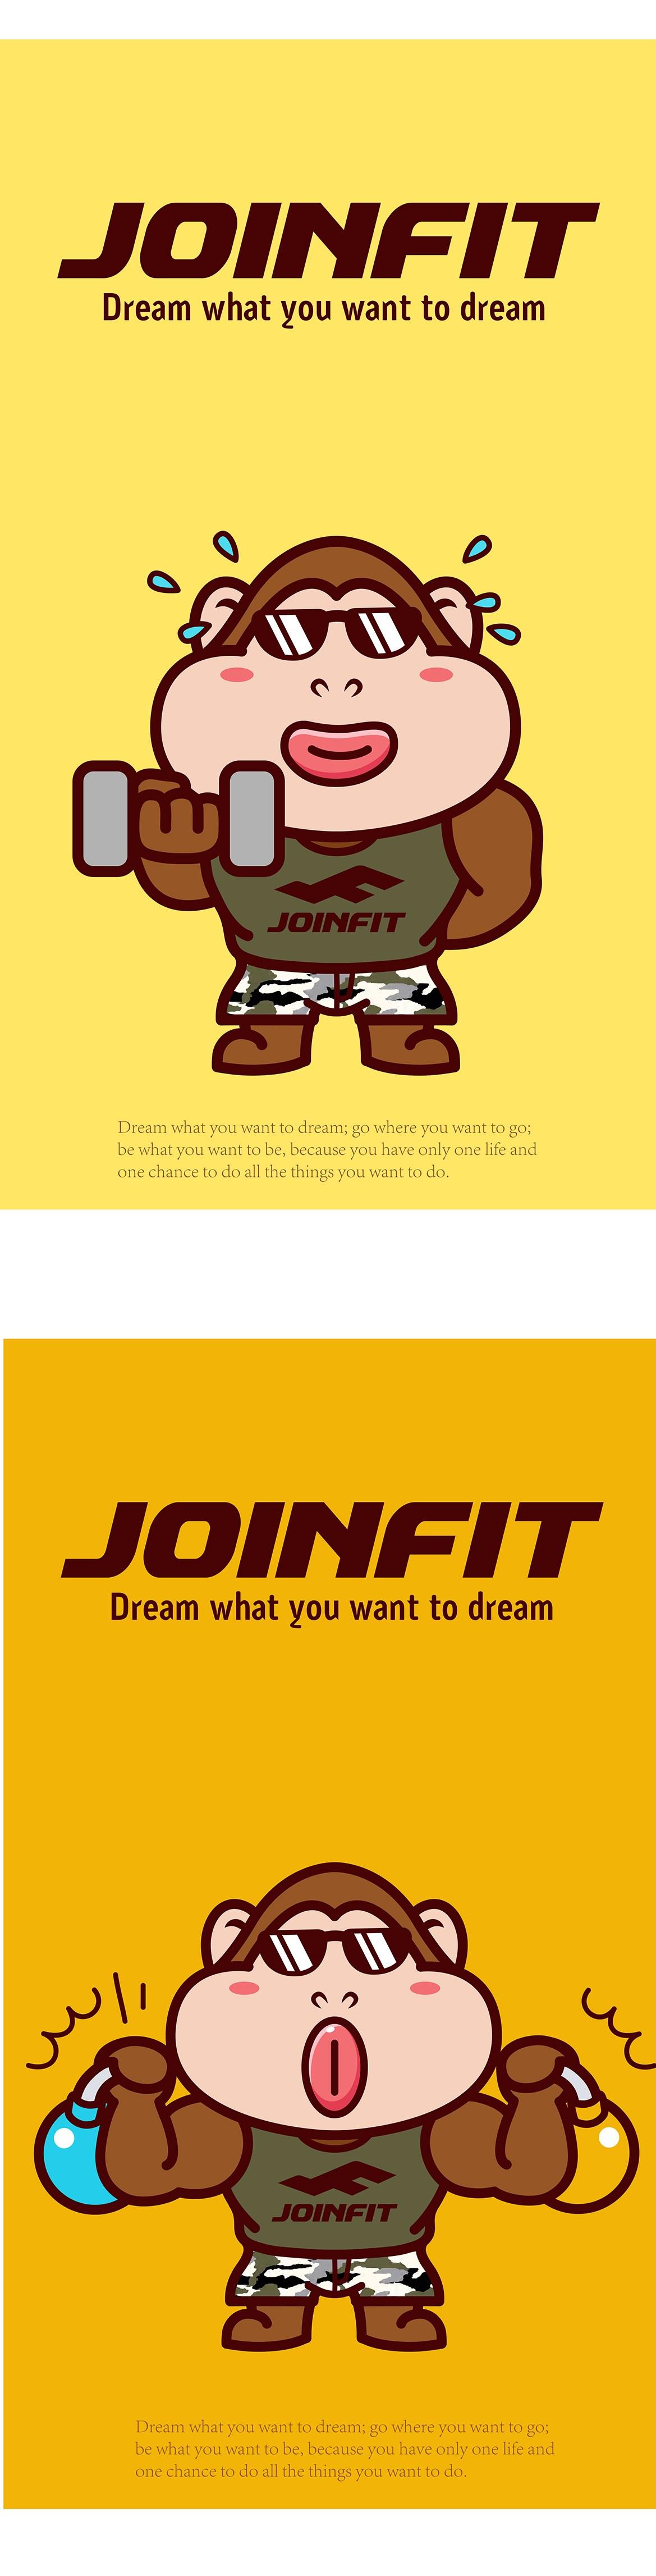 JOINFIT健身器材品牌卡通形象吉祥物设计微信表情gif设计---茁茁猫原创设计